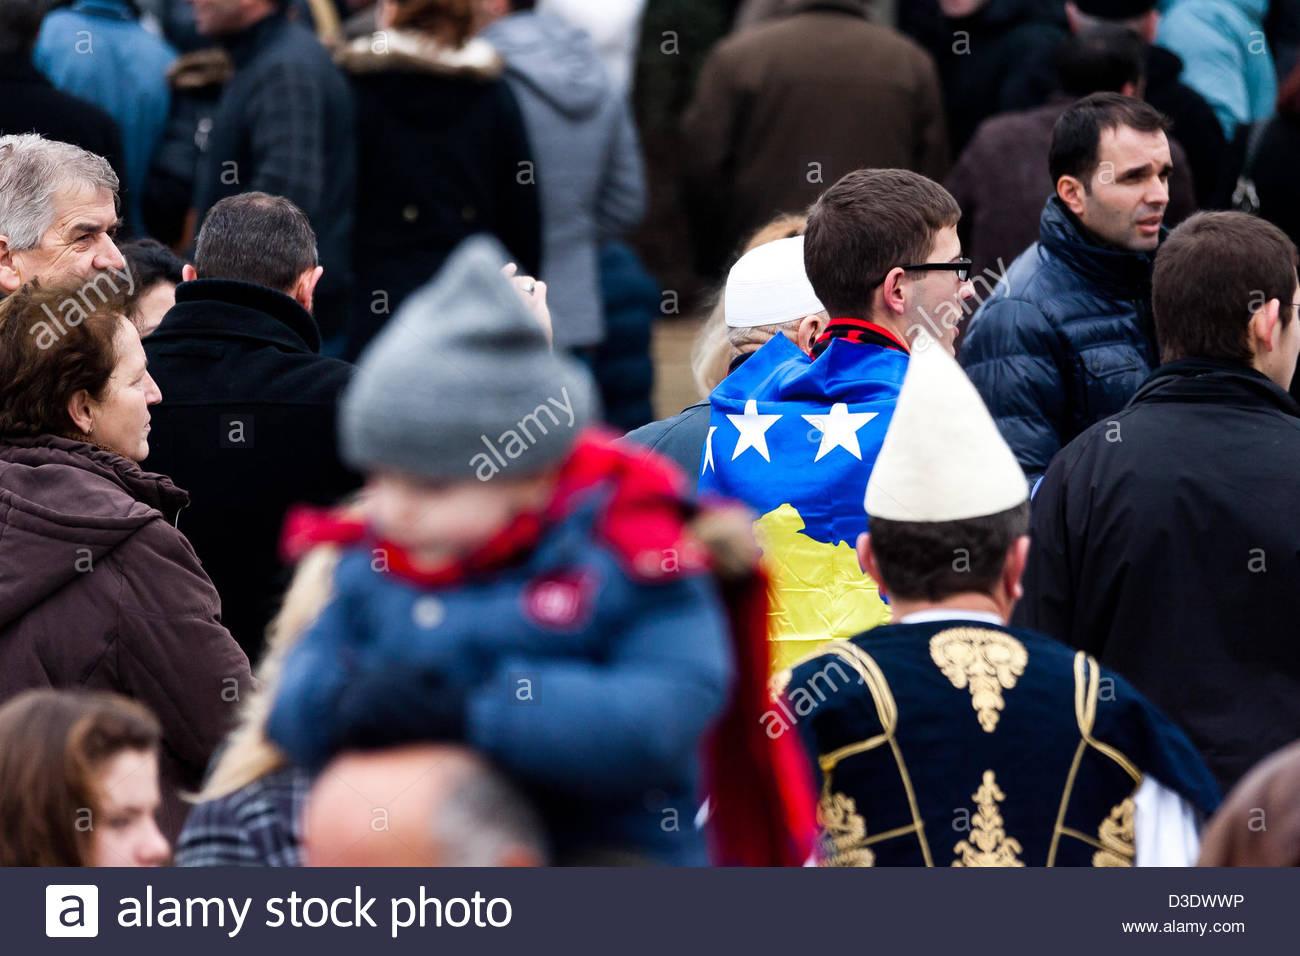 Feb. 17, 2013 - Pristina, Kosovo - Kosovo Albanians attend celebrations marking the fifth anniversary of Kosovo's - Stock Image